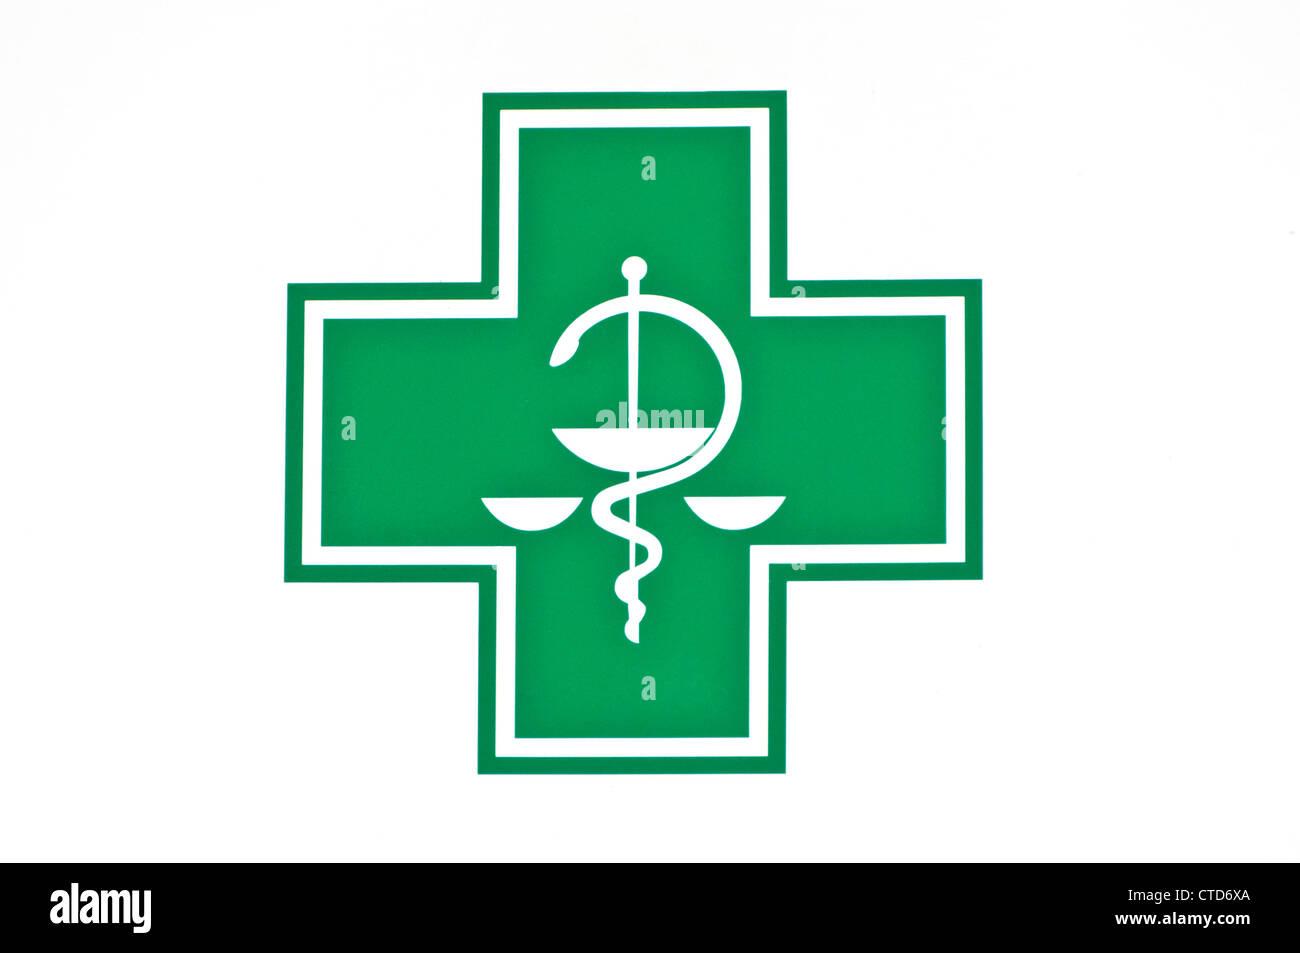 caduceus symbol of medicine Stock Photo